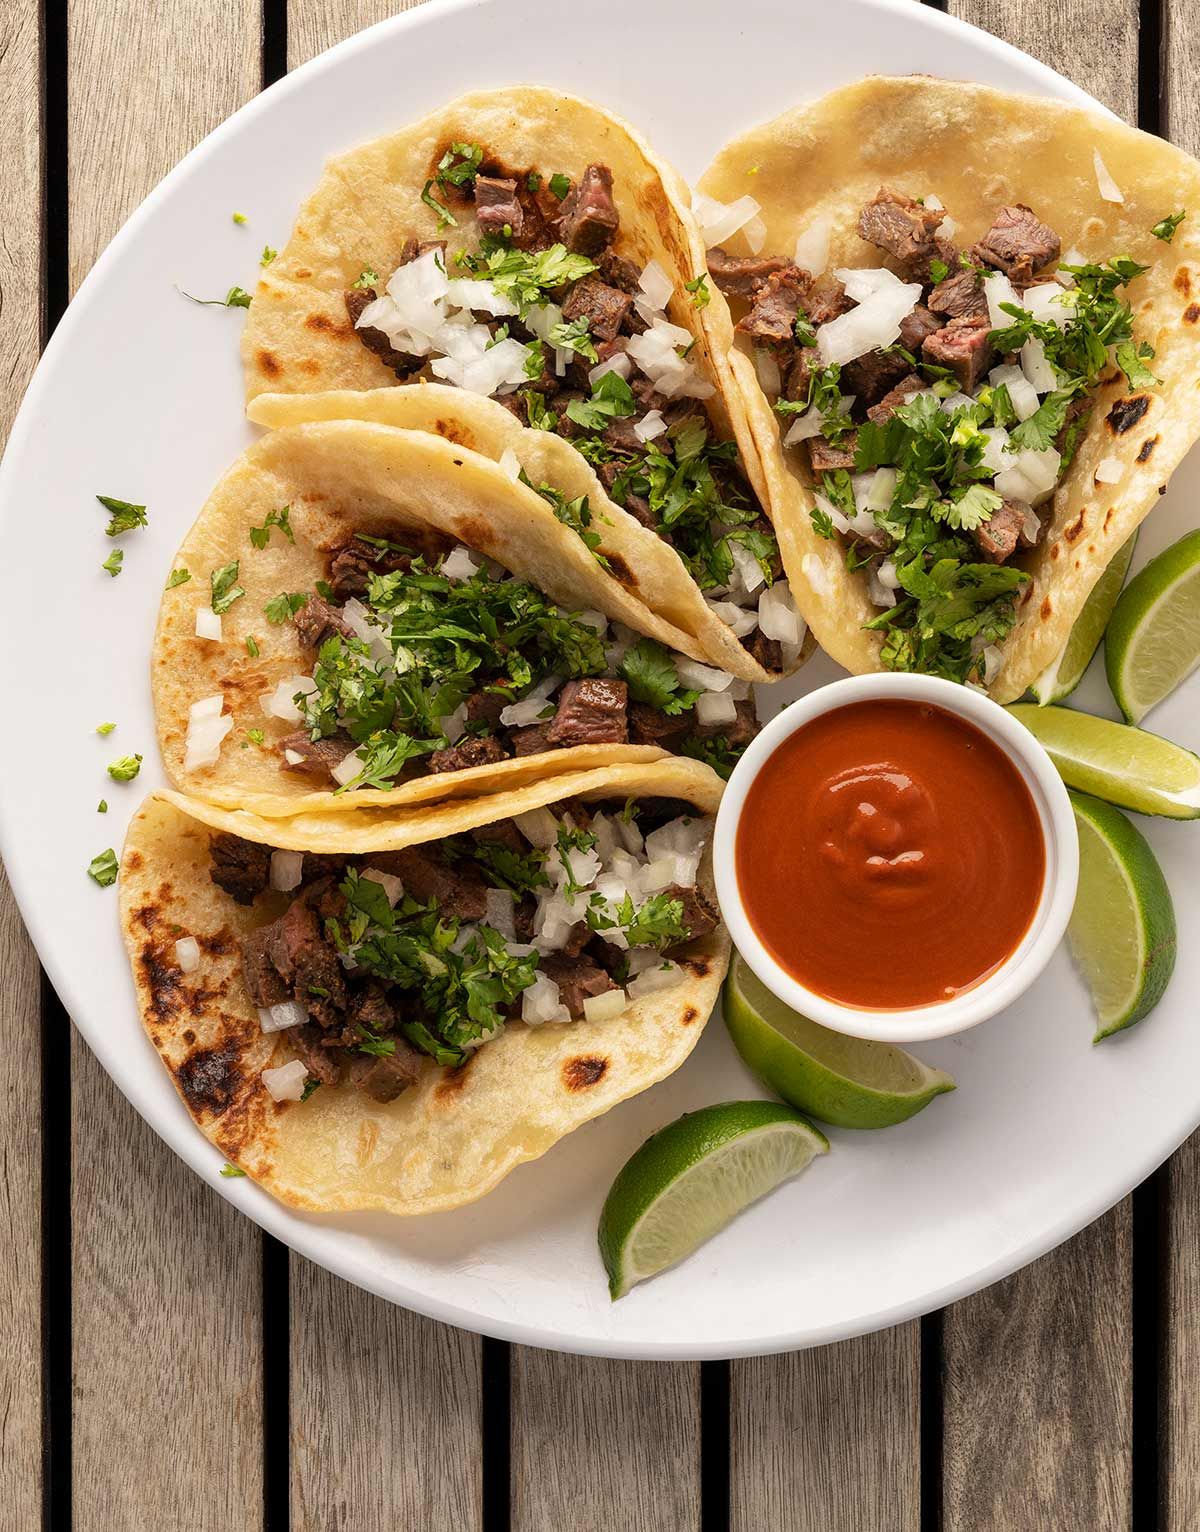 Arrachera tacos on a plate ready to eat